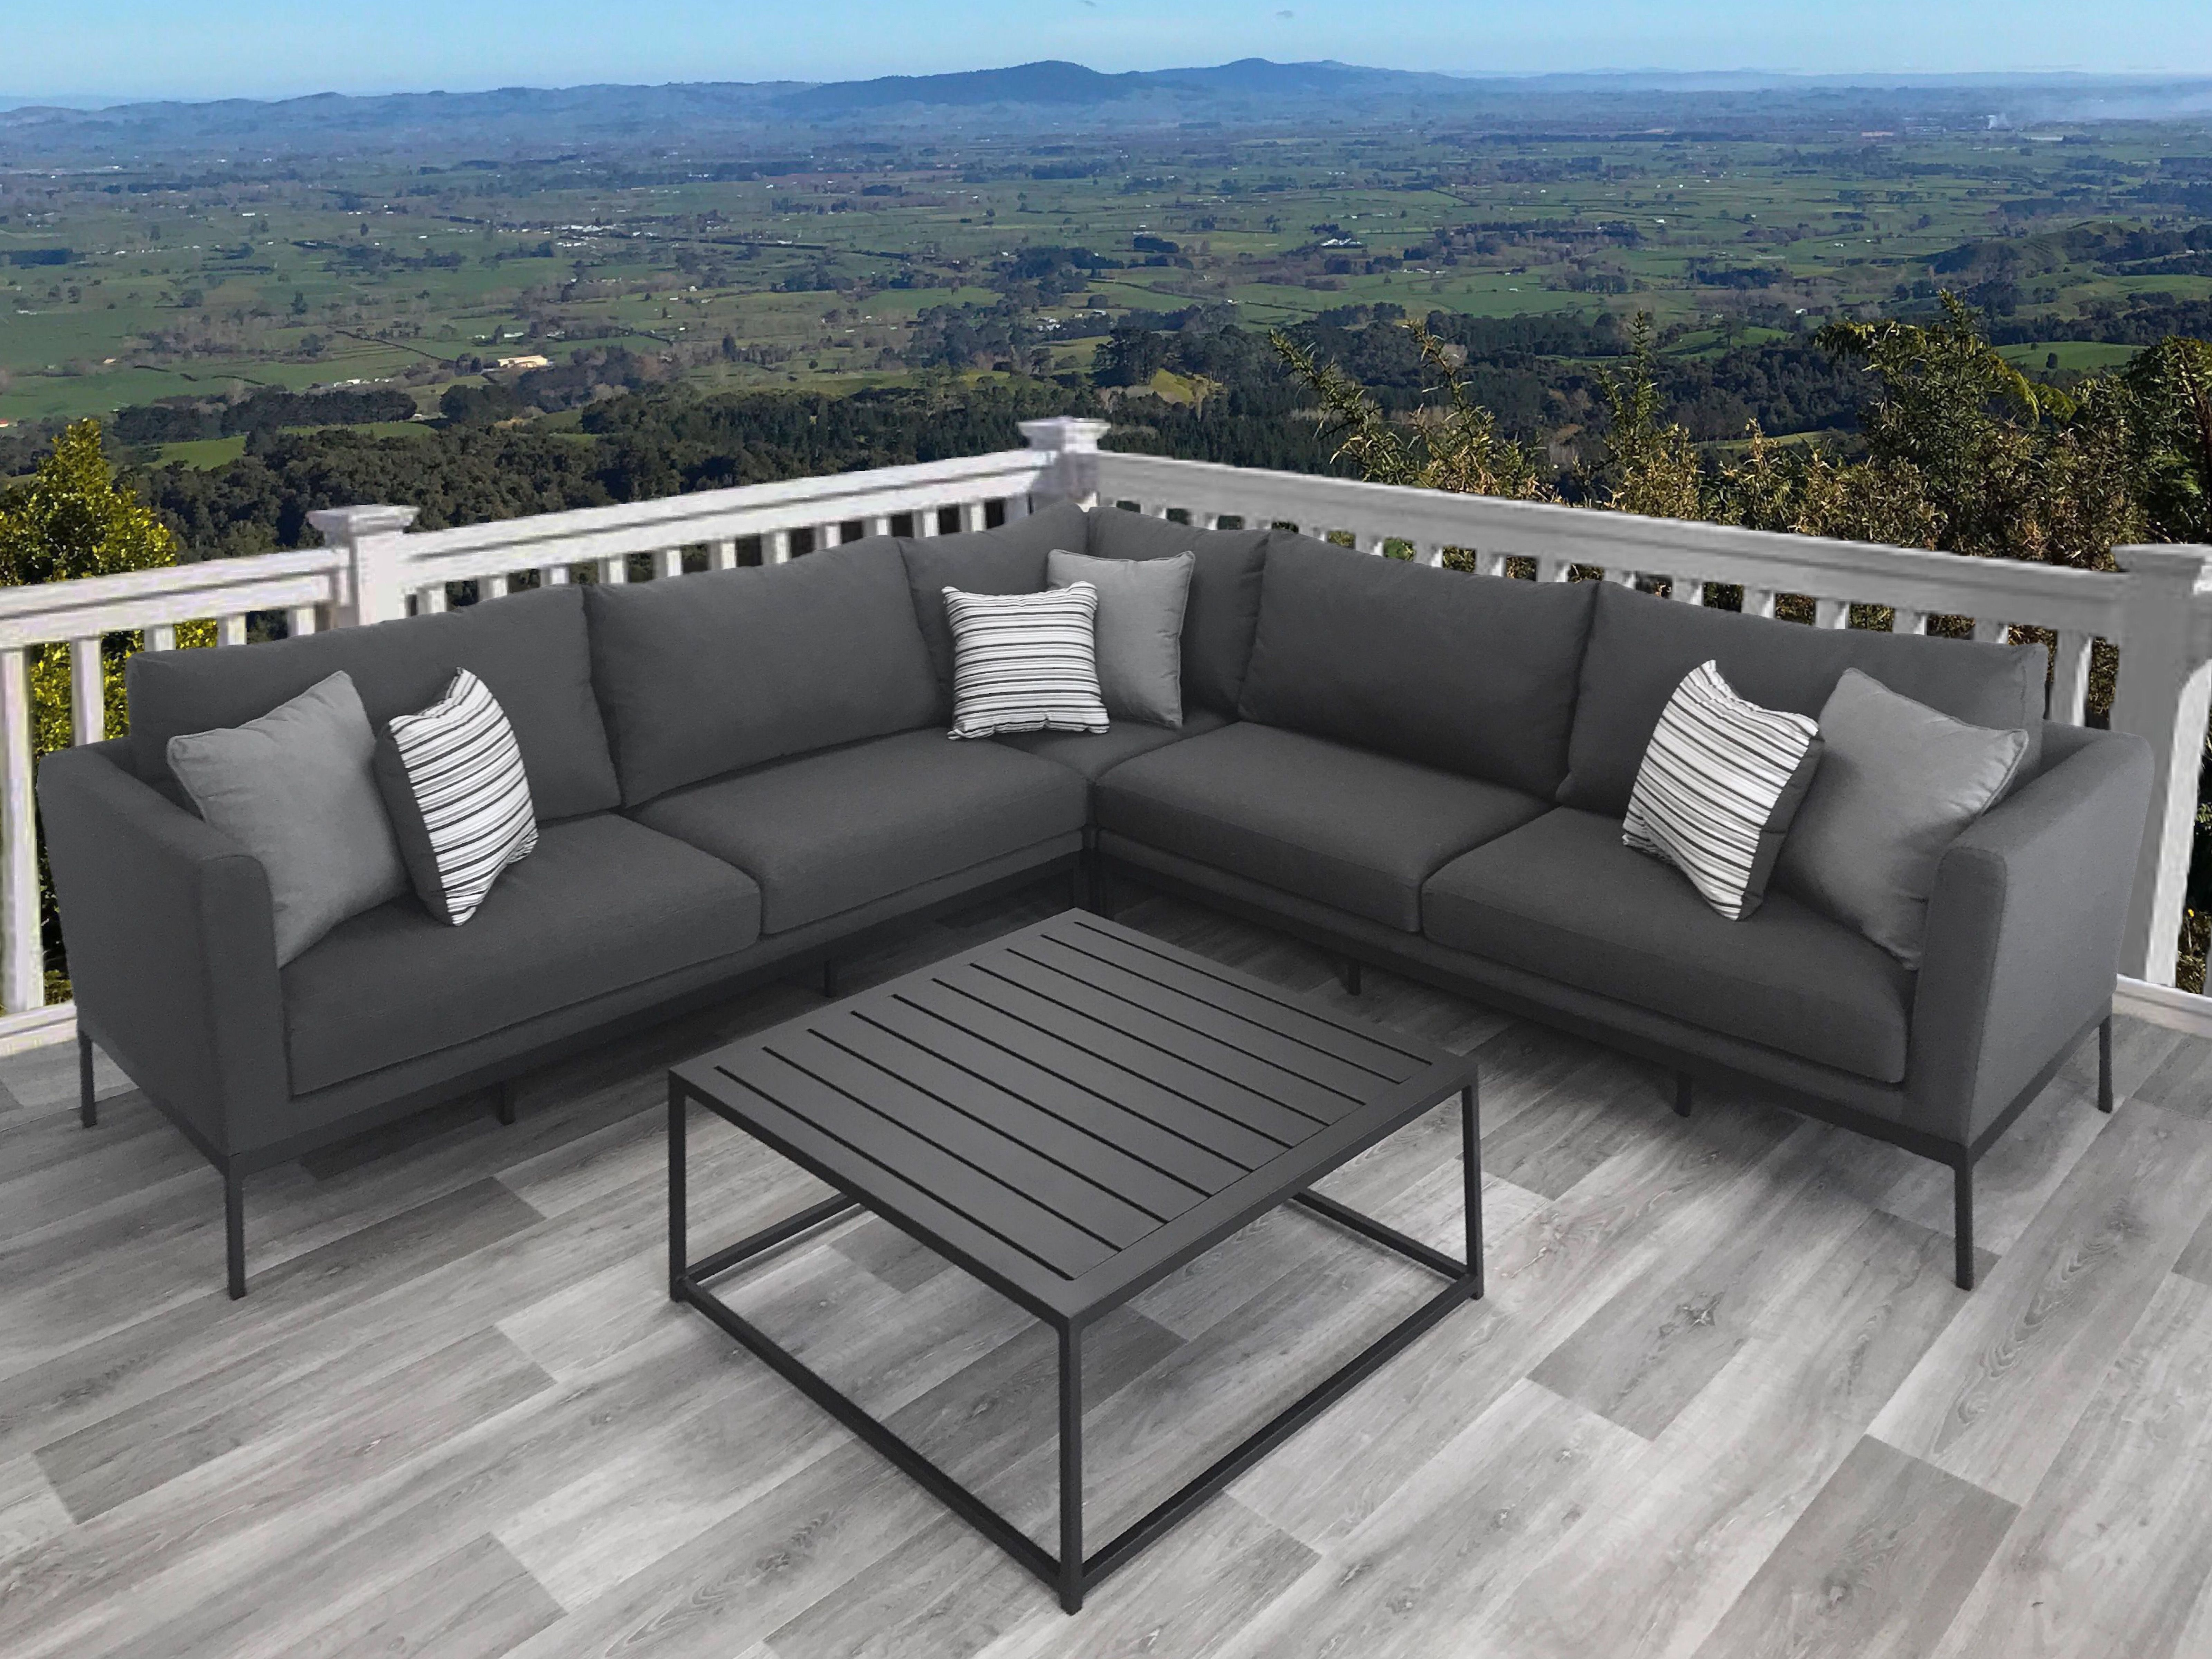 Outdoor Furniture Auckland Tauranga Hamilton  Outdoor furniture